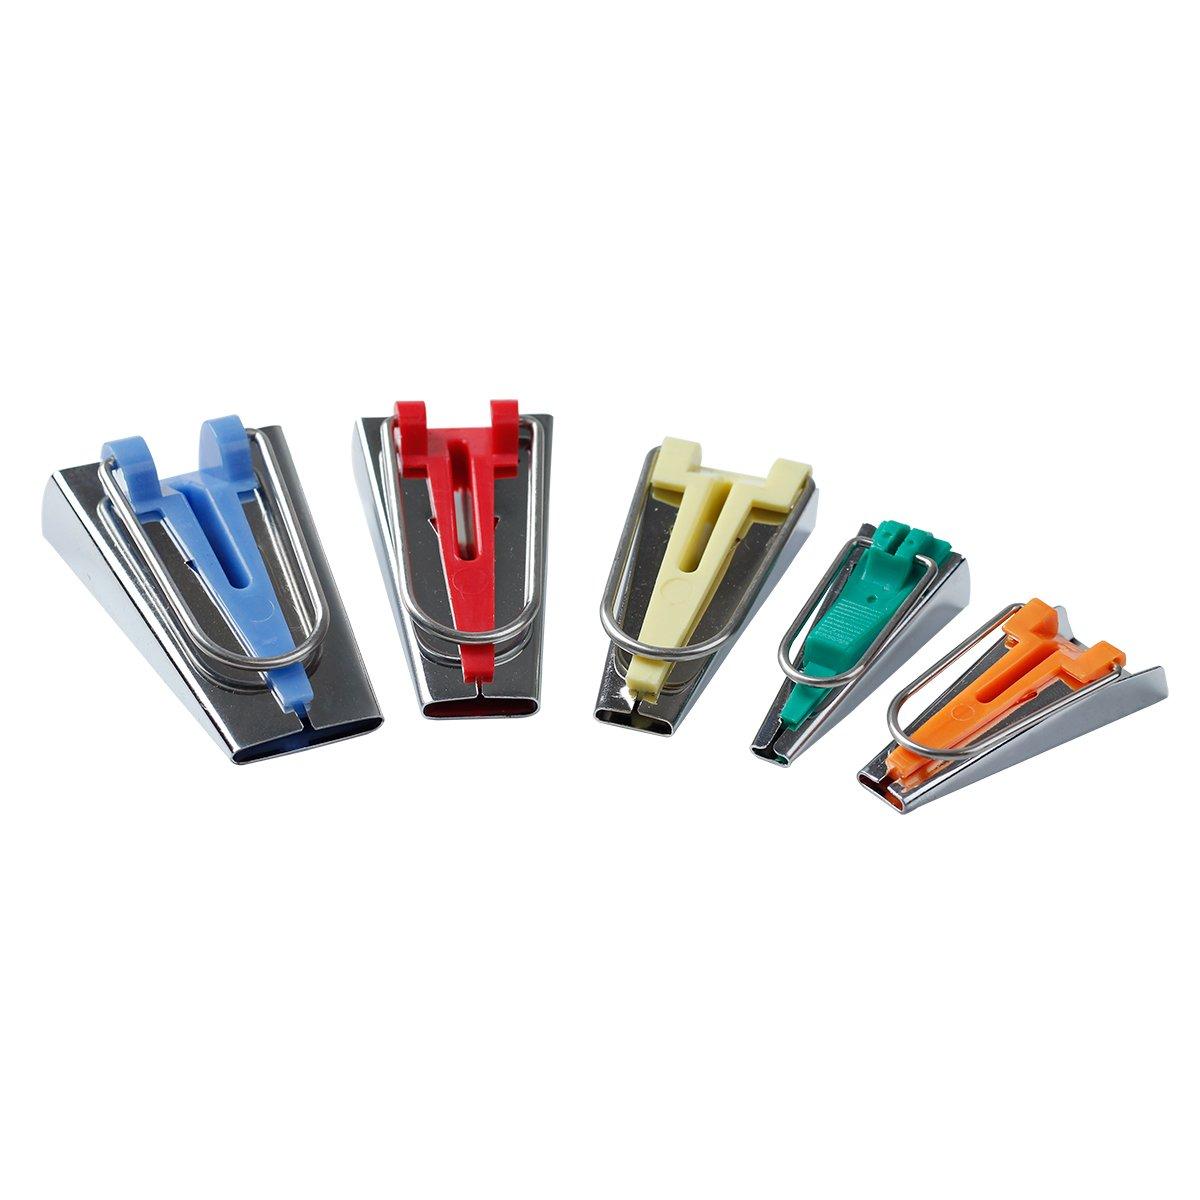 HONEYSEW Bias Tape Maker Set 6MM/9MM/12MM/18MM/25MM 5 sizes DIY Quilting Tools Kit 4337014117